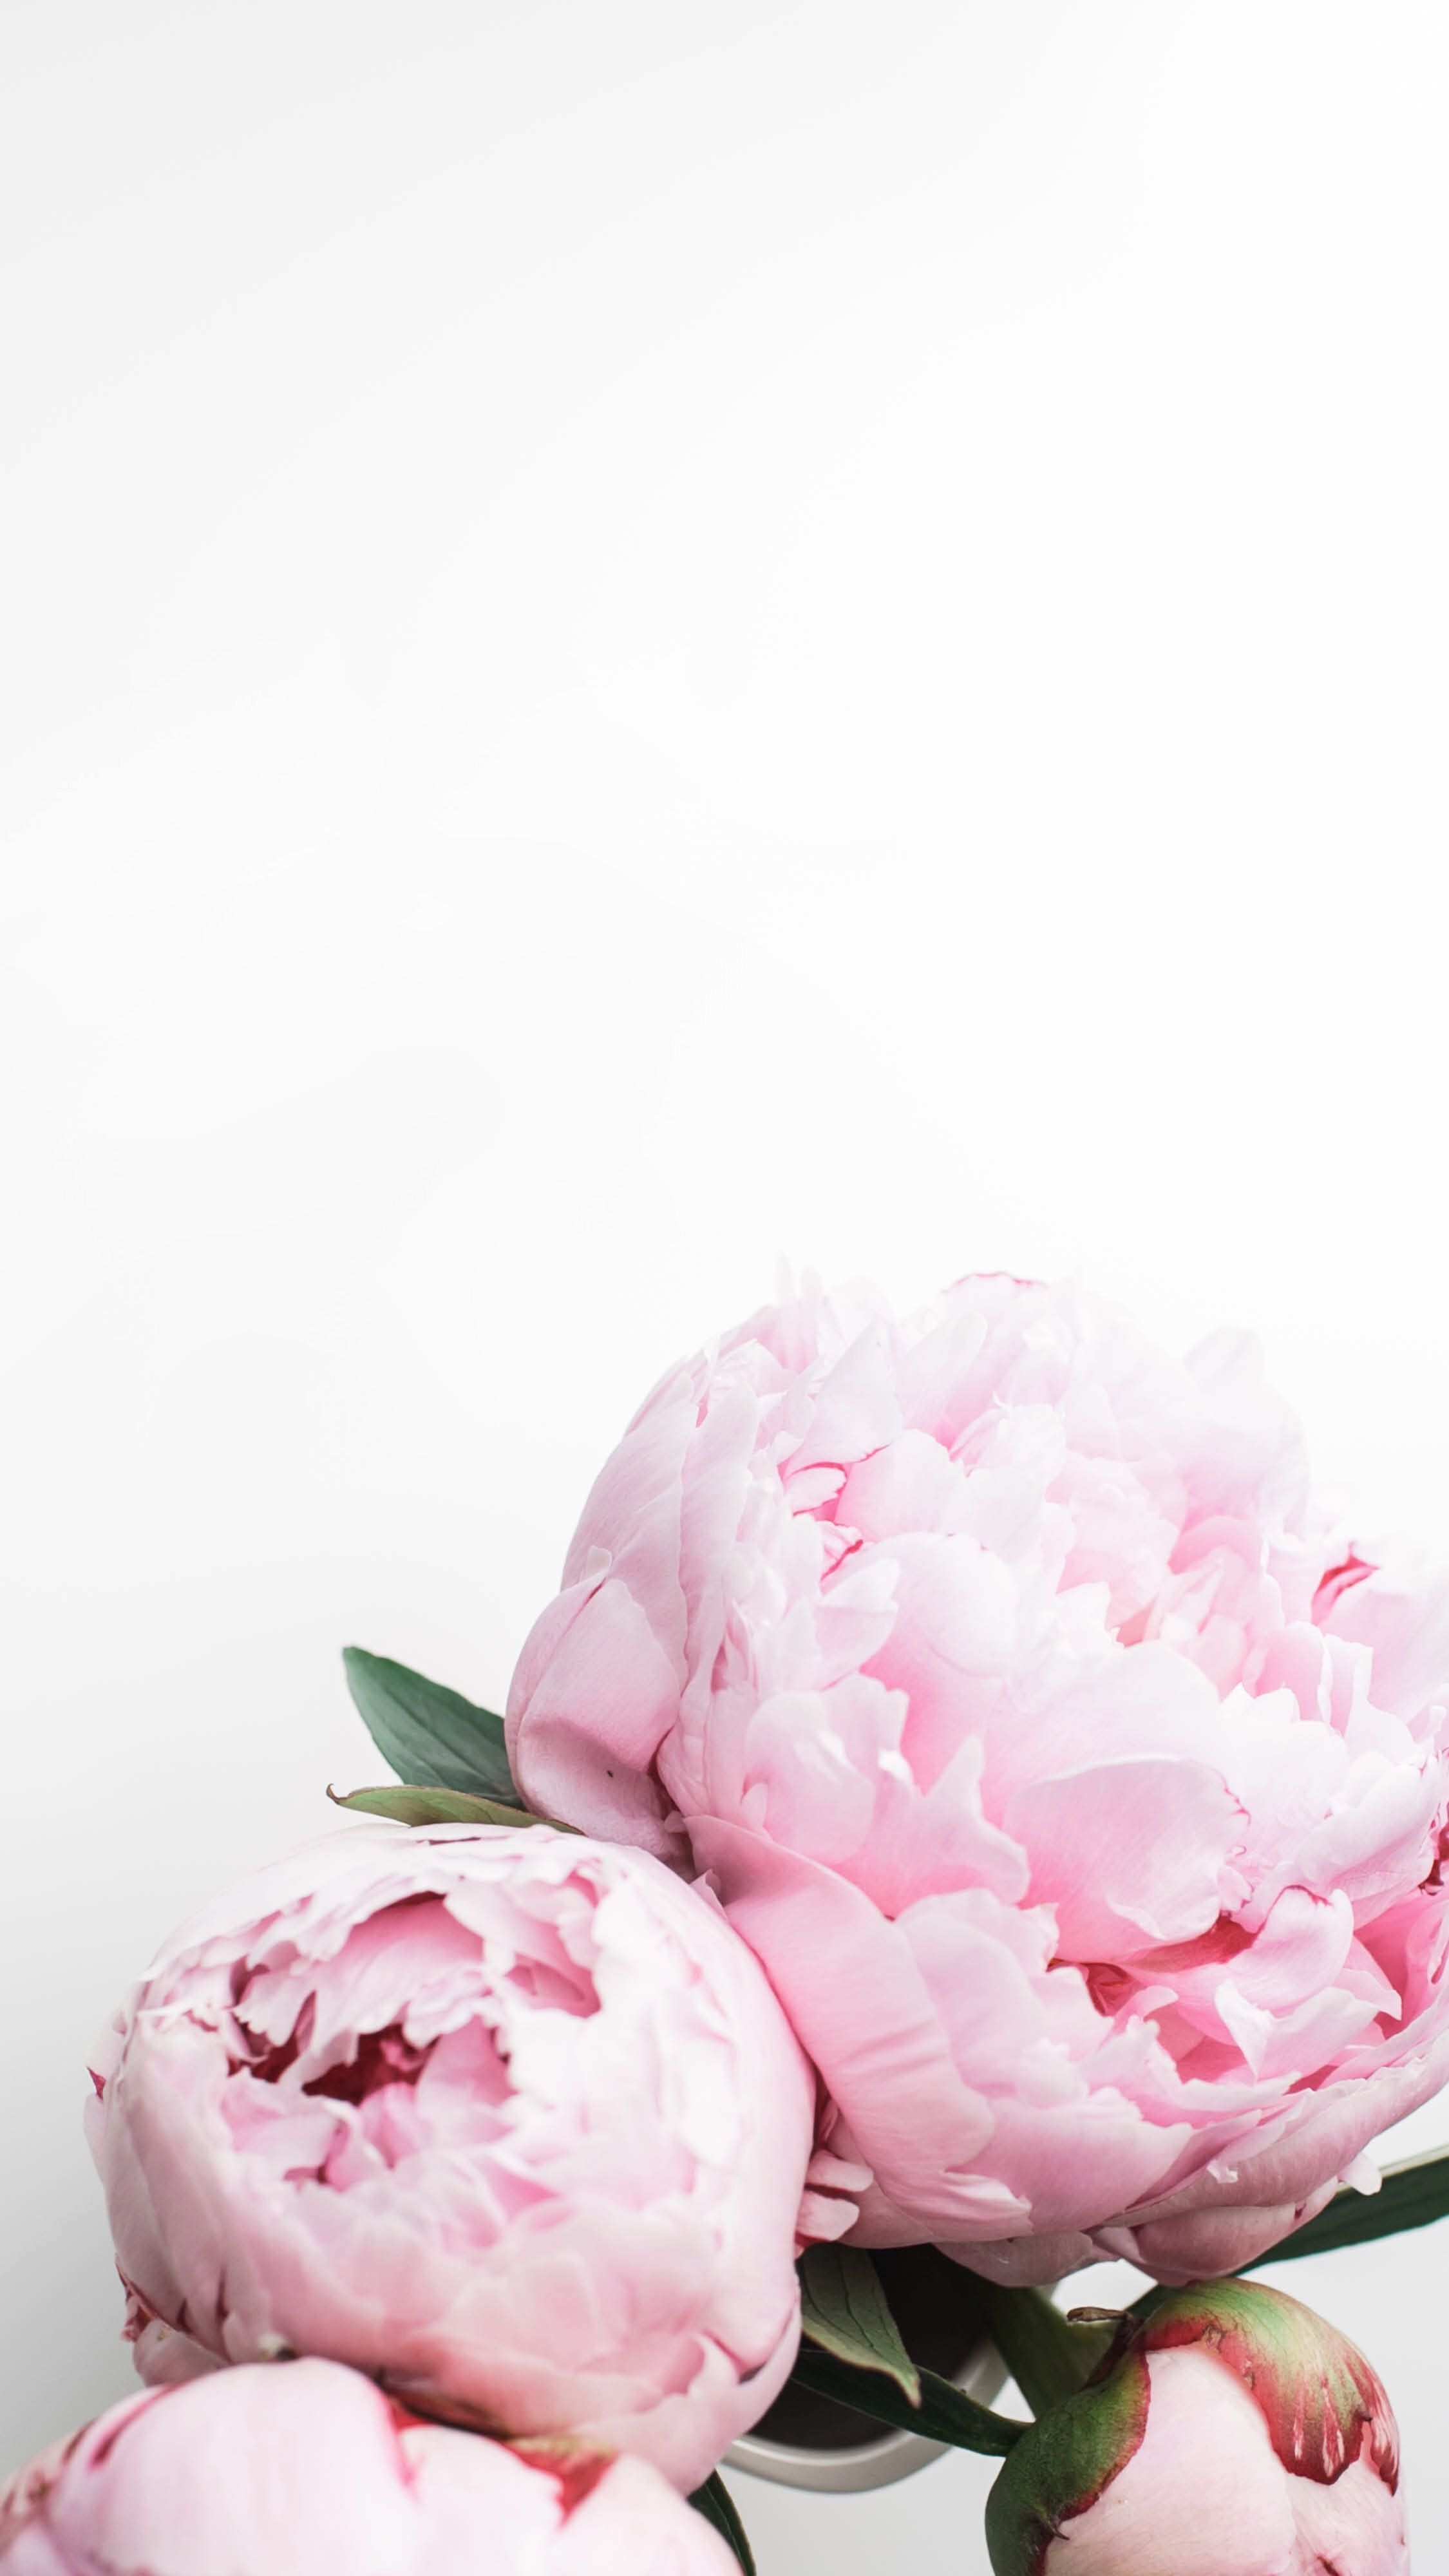 peonies iphone wallpaper iphonebackgrounds blank floral iphone